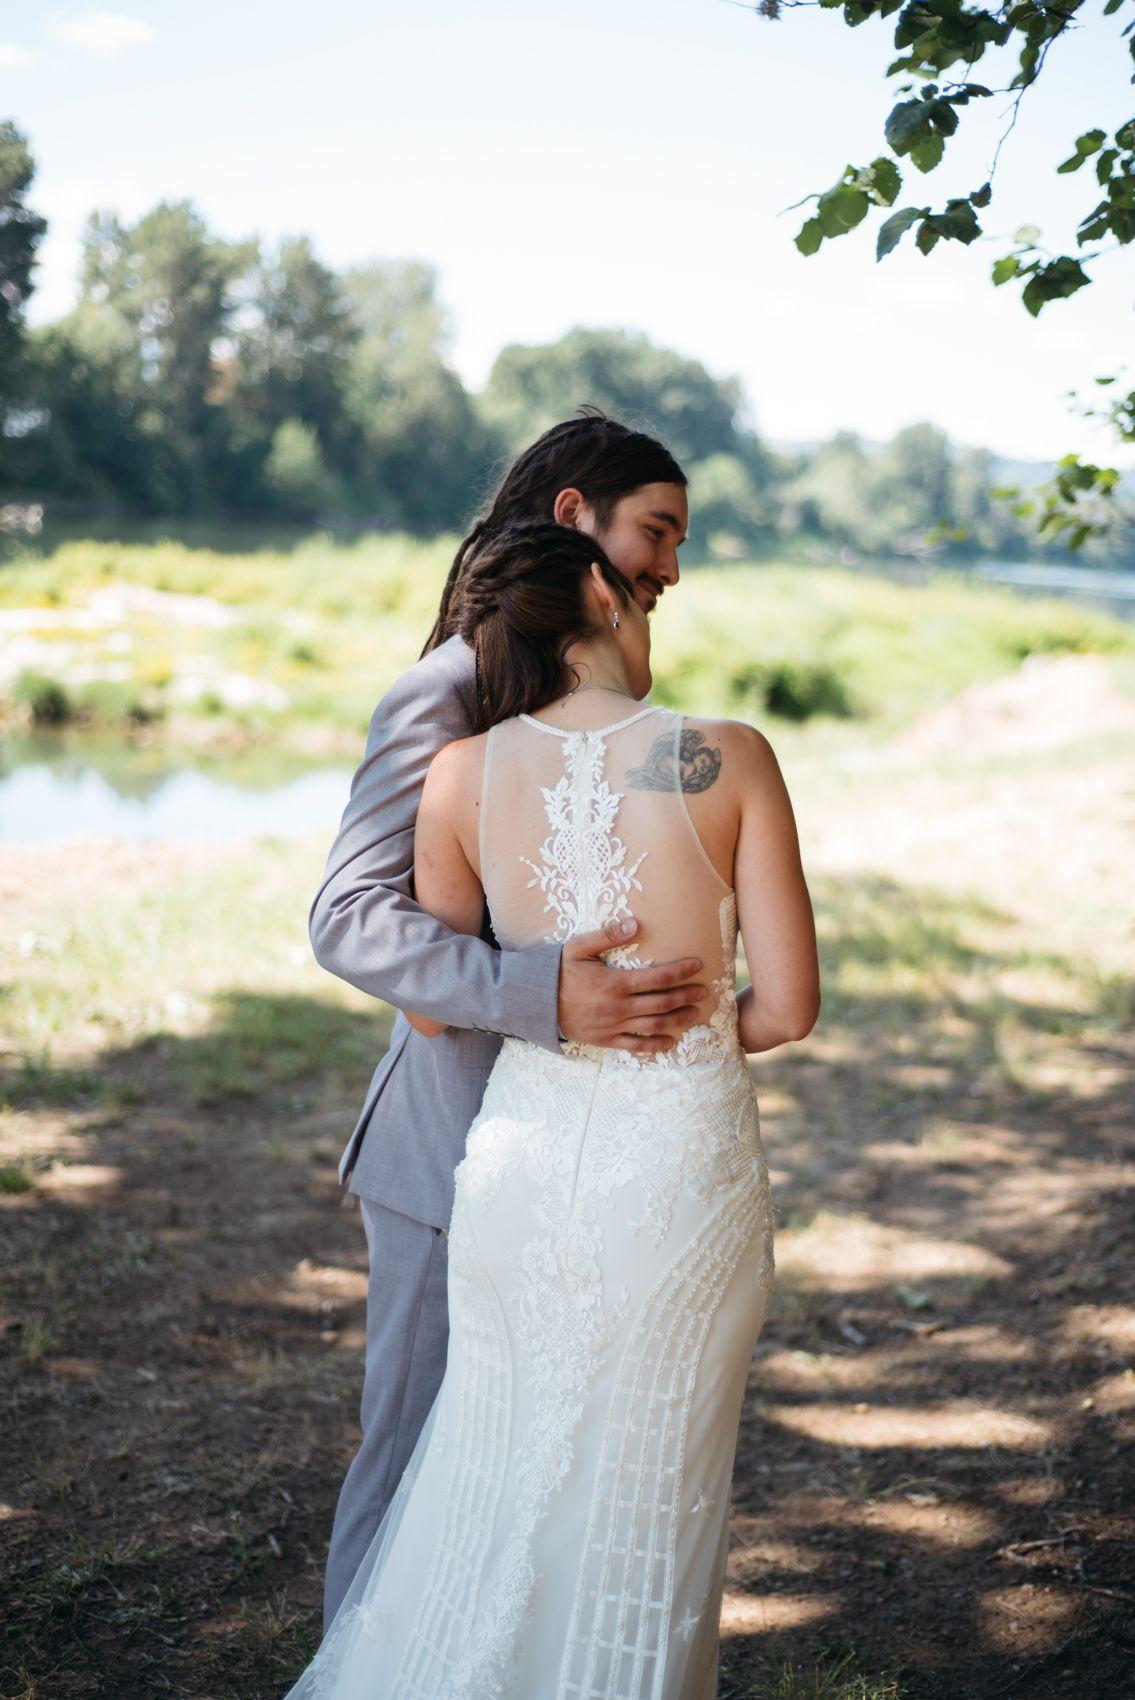 weddingweb-65496.jpg